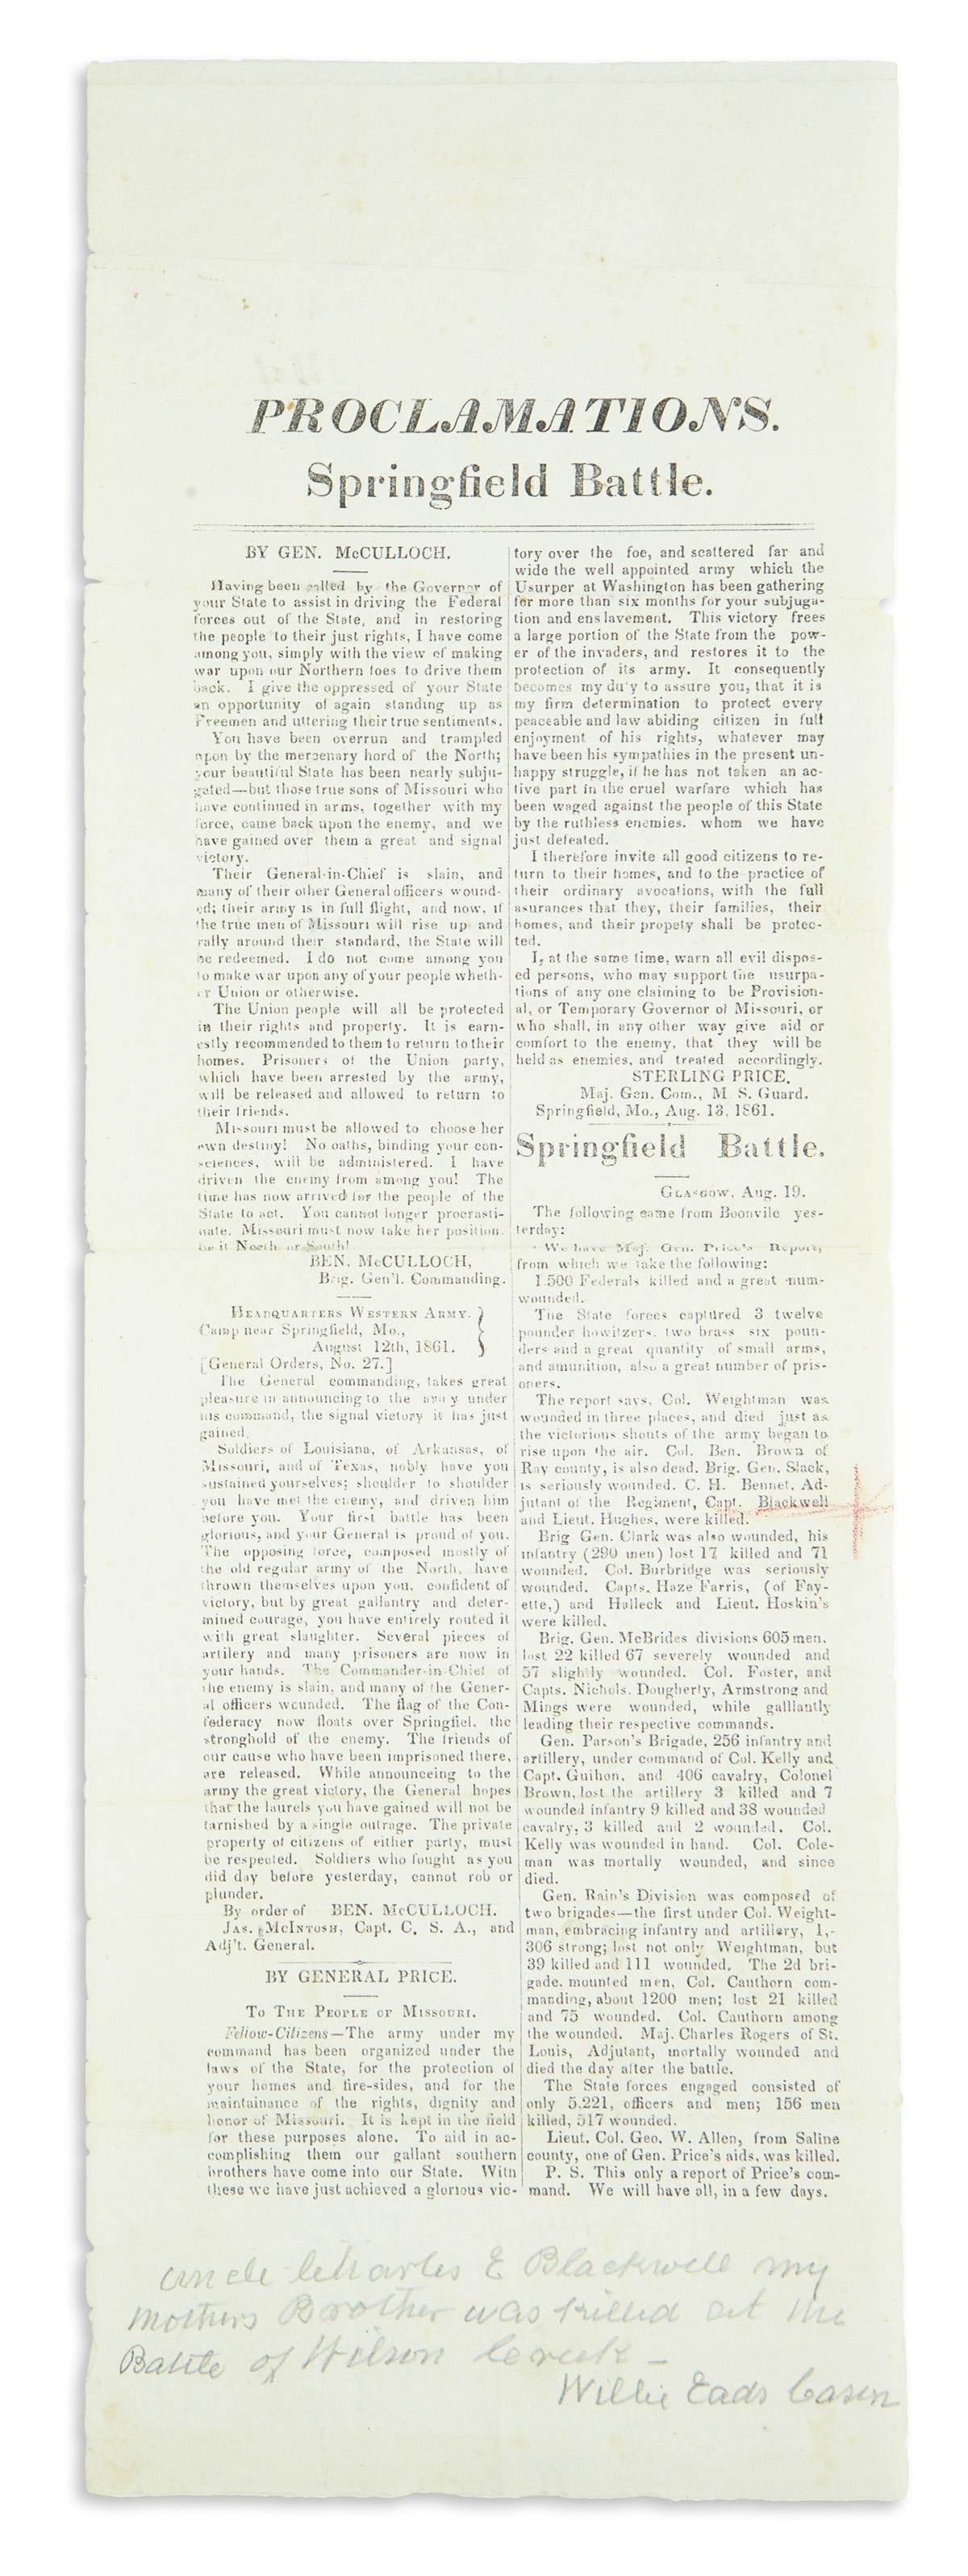 (CIVIL-WAR--CONFEDERATE)-Proclamations-Springfield-Battle